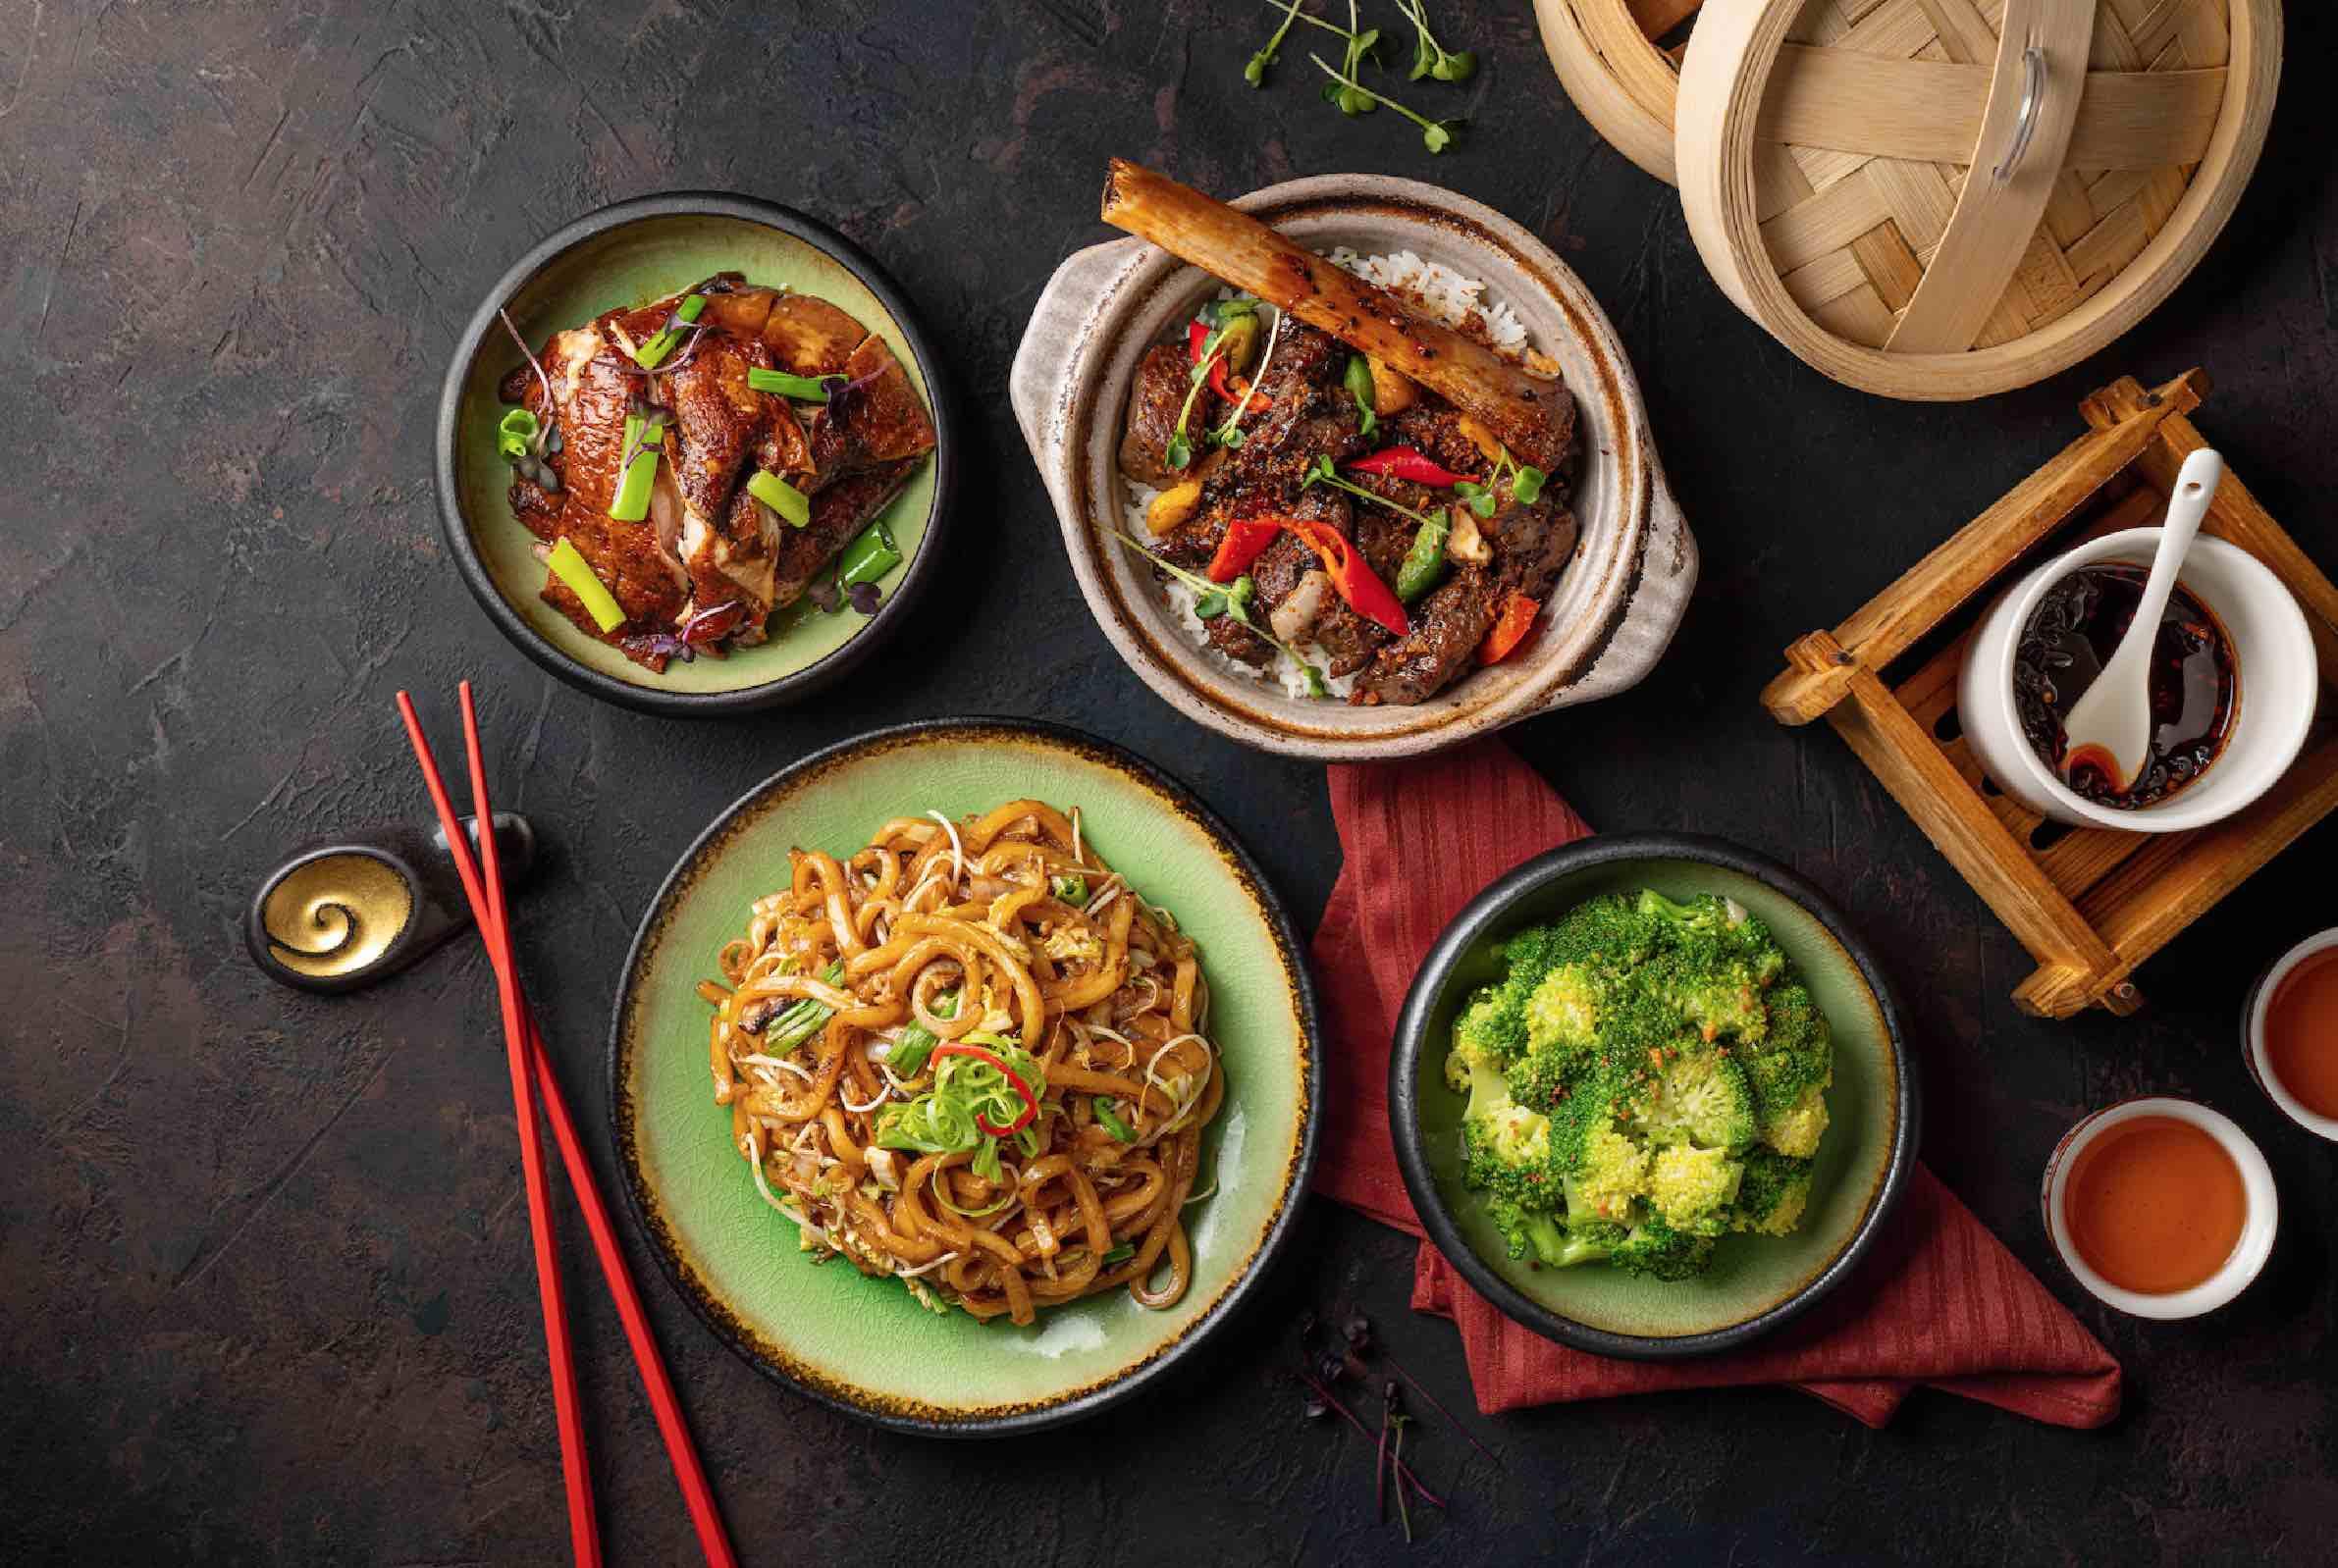 Shang Supper Club